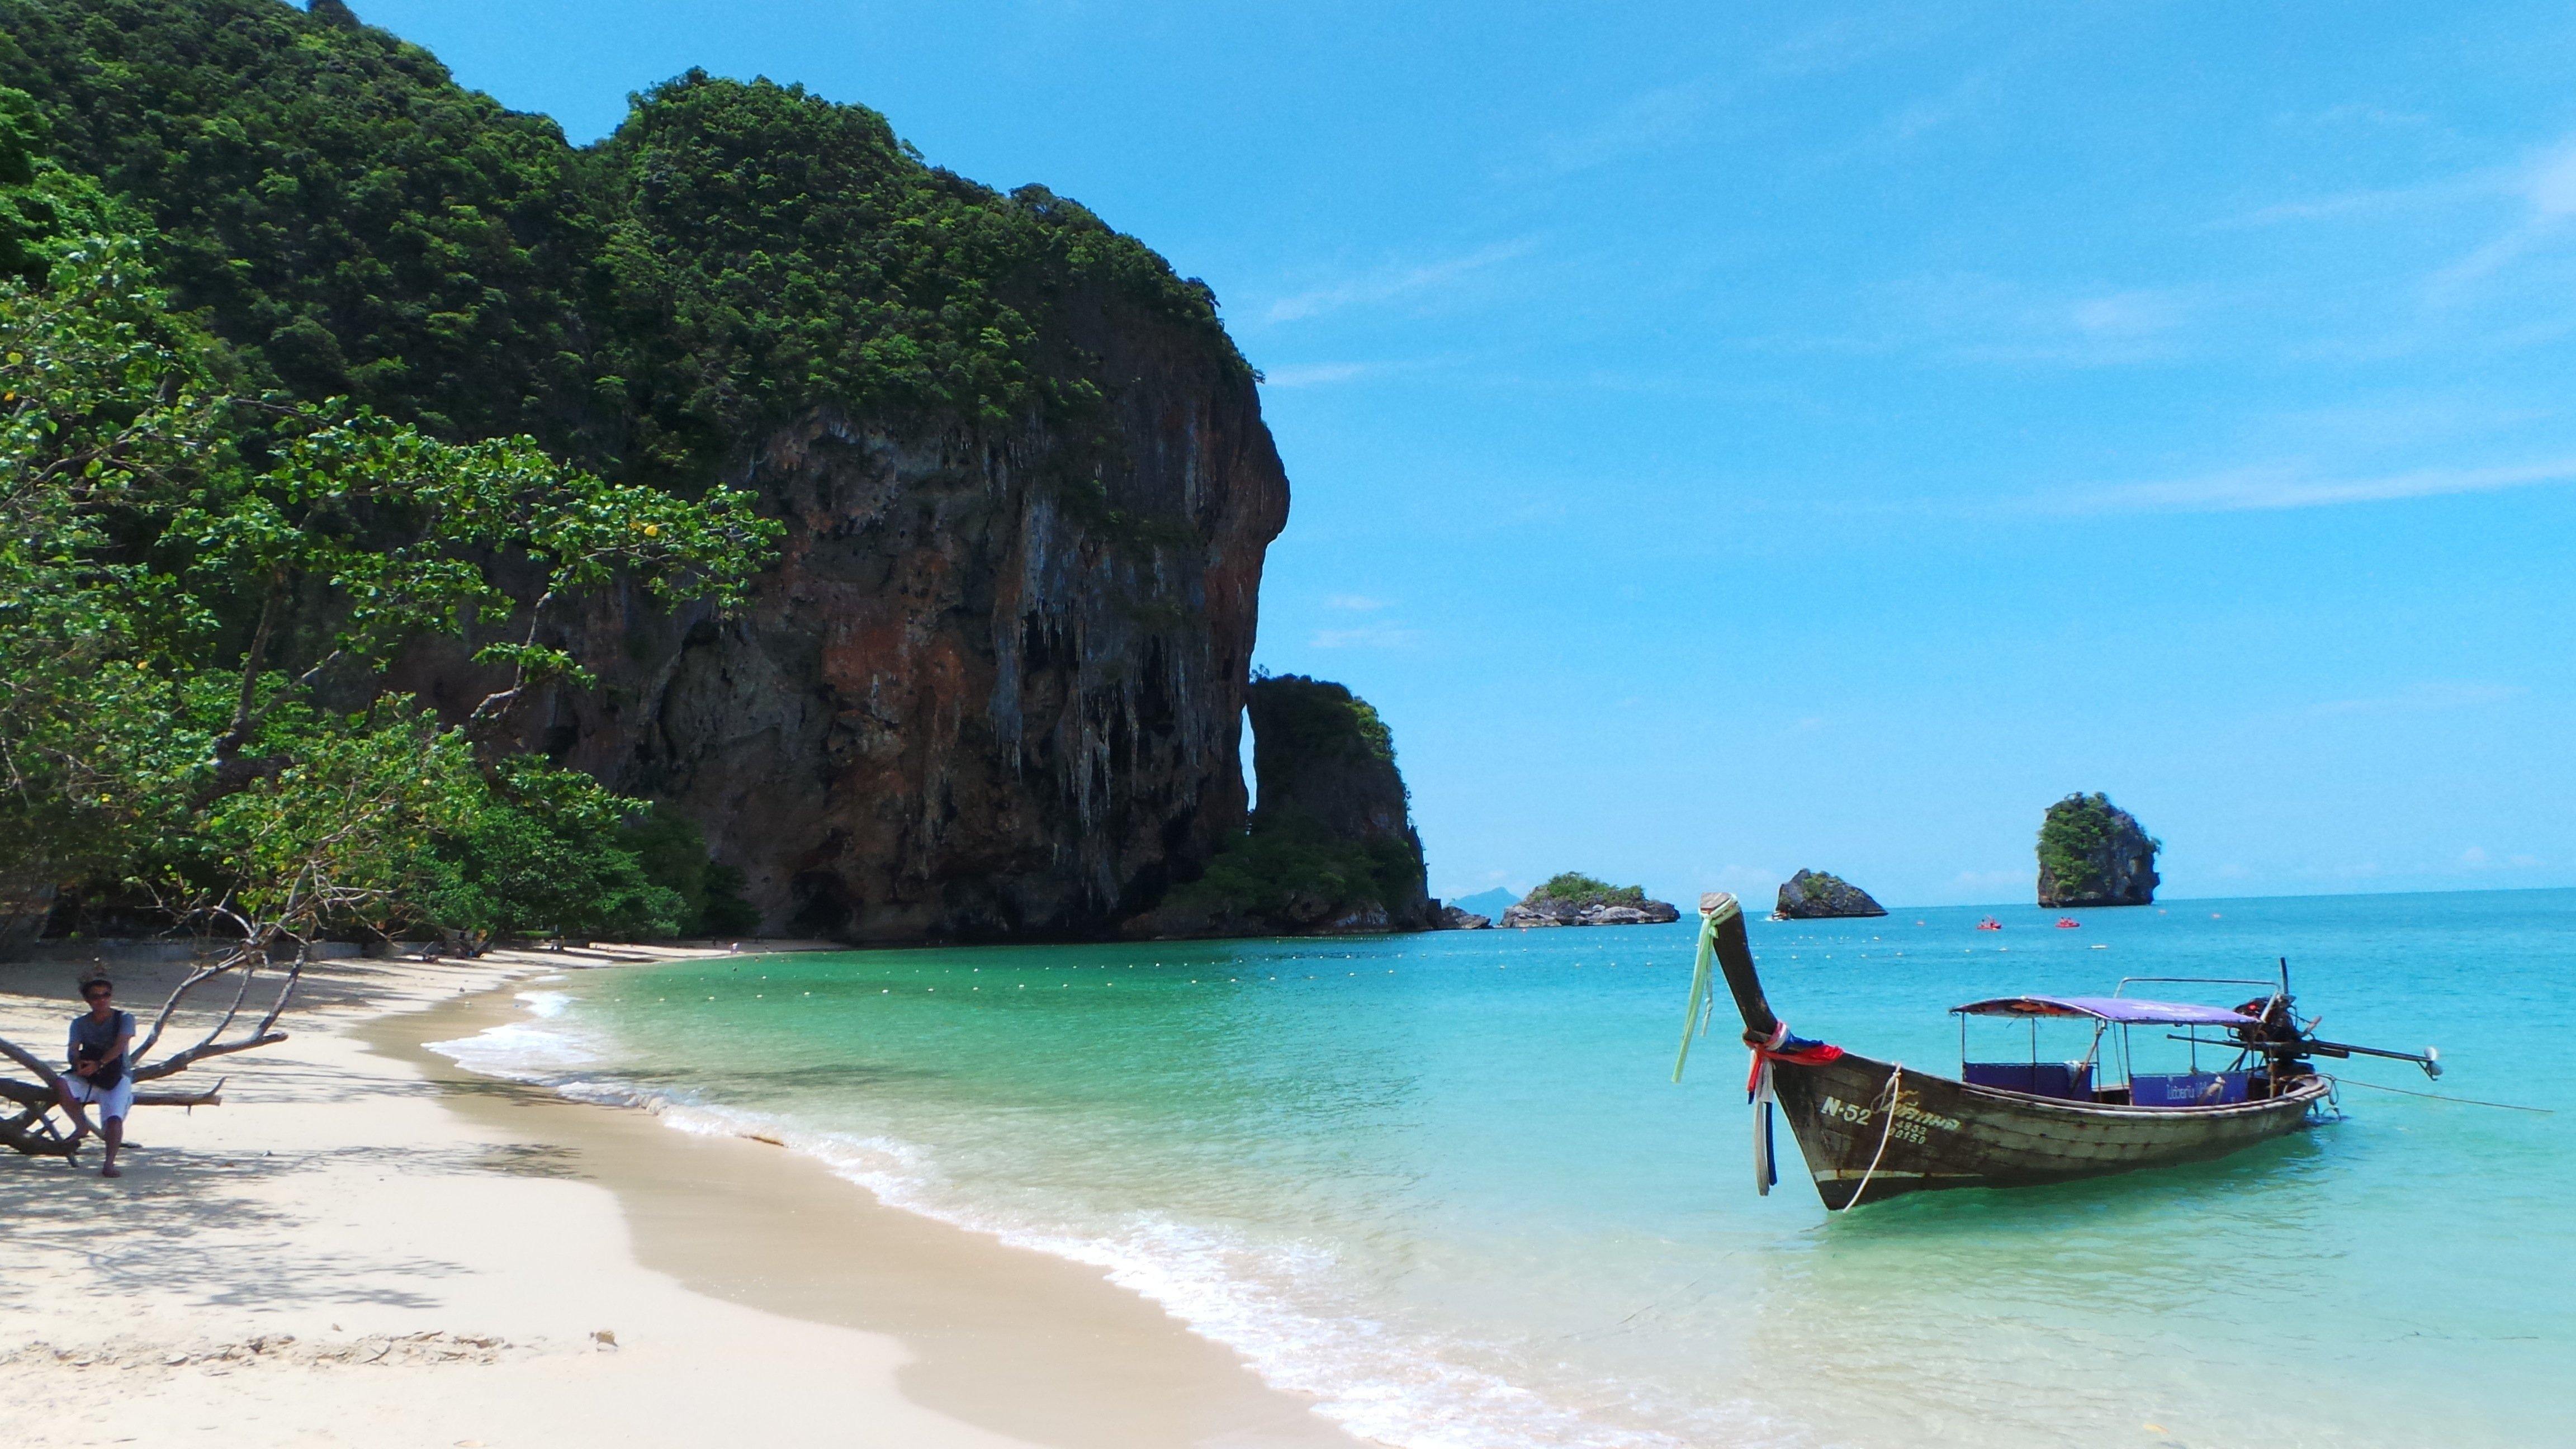 Railay Beach Thailand Wallpaper Stock Images t2ix3c91   Yoanucom 4608x2592